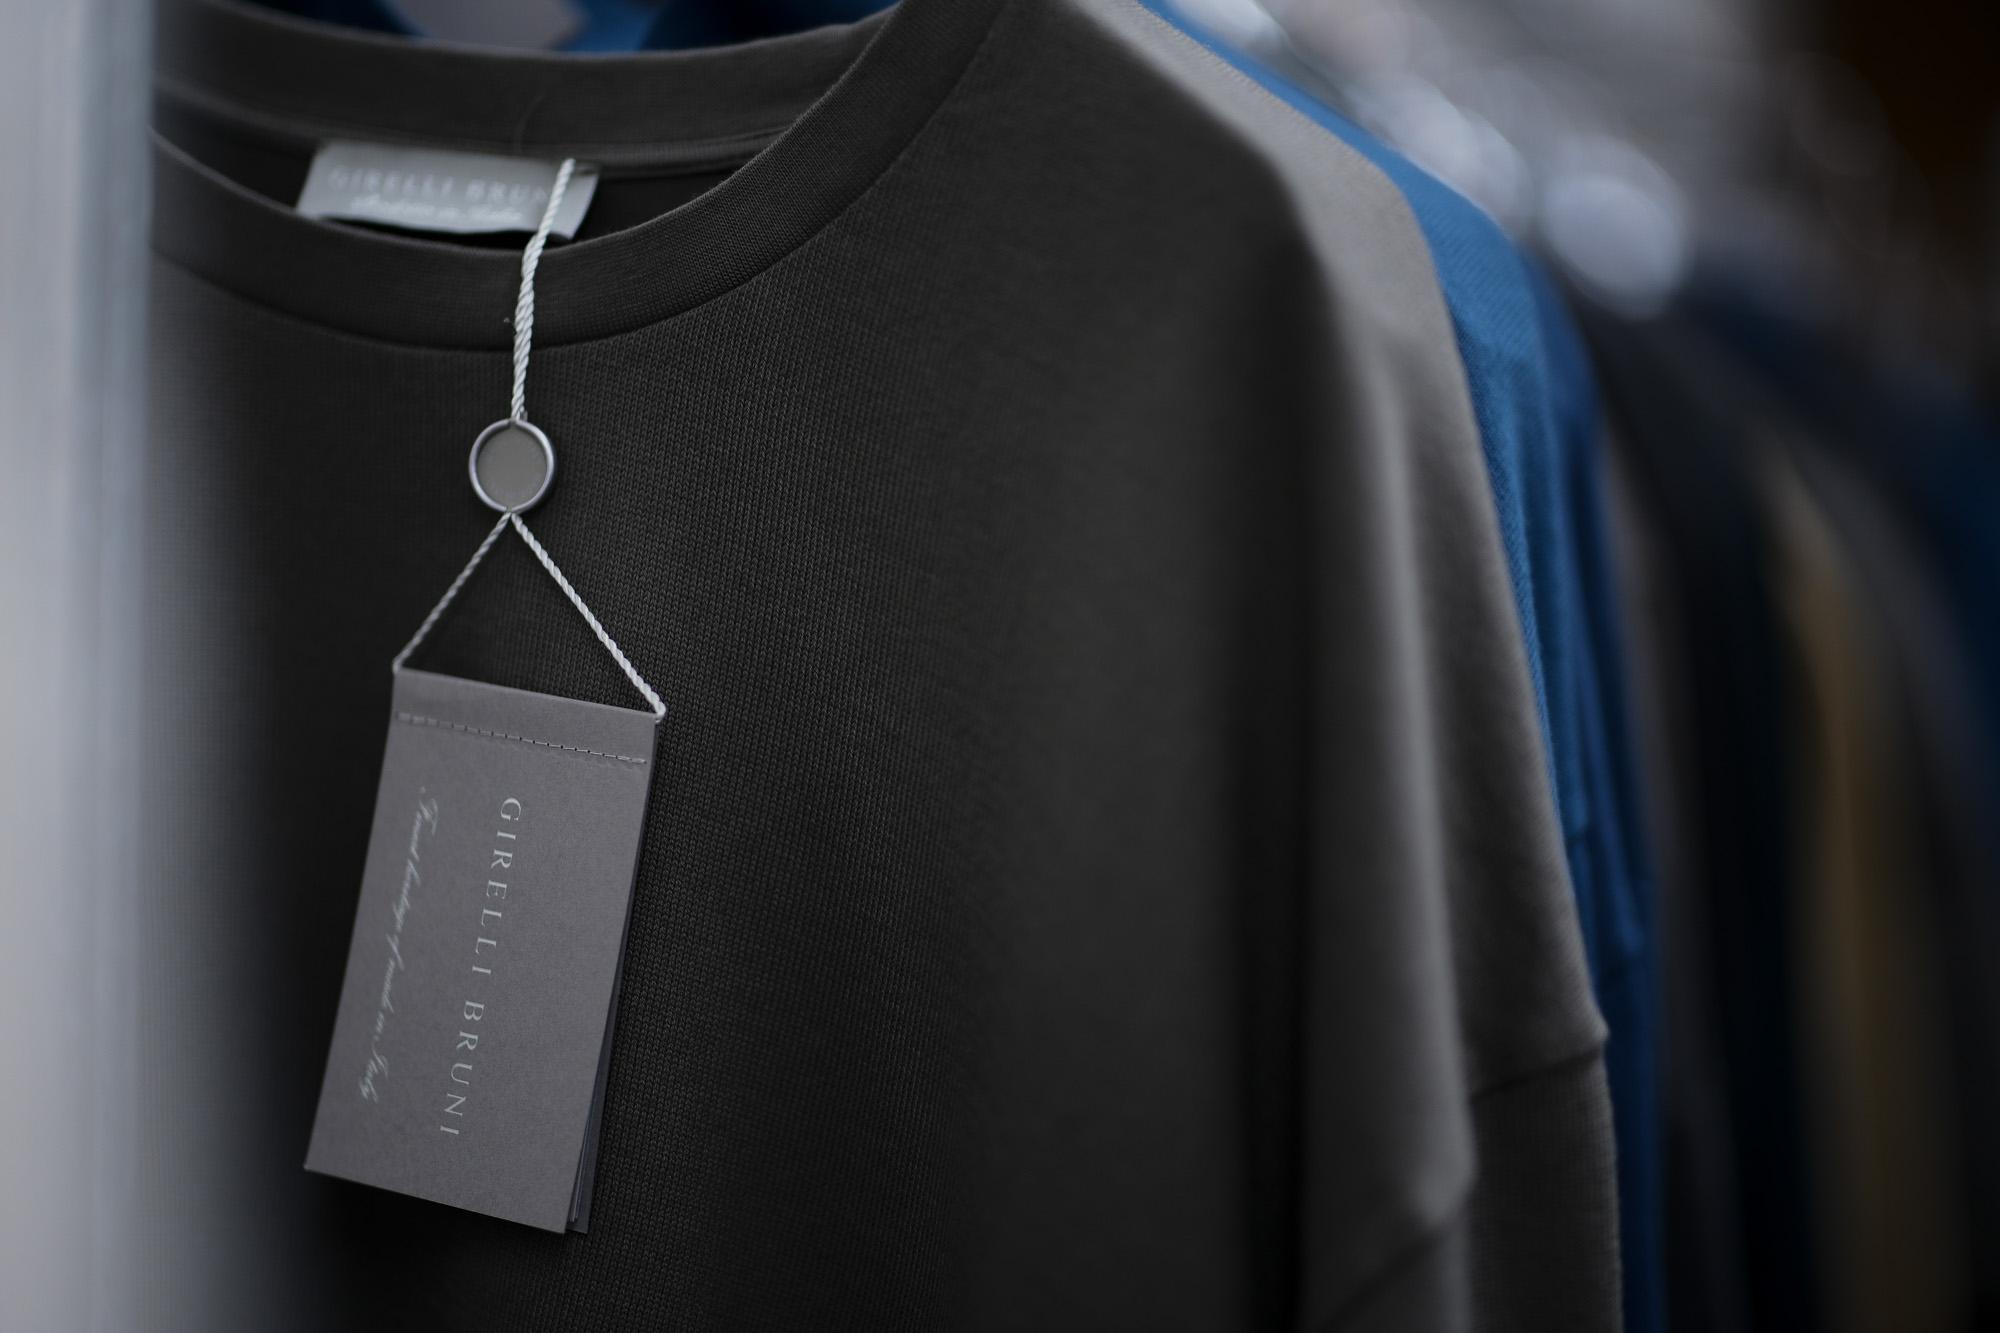 Girelli Bruni / ジレリブルーニ (2019 秋冬展示会) girellibruni Tシャツ カットソー 愛知 名古屋 altoediritto アルトエデリット 白Tシャツ 黒Tシャツ